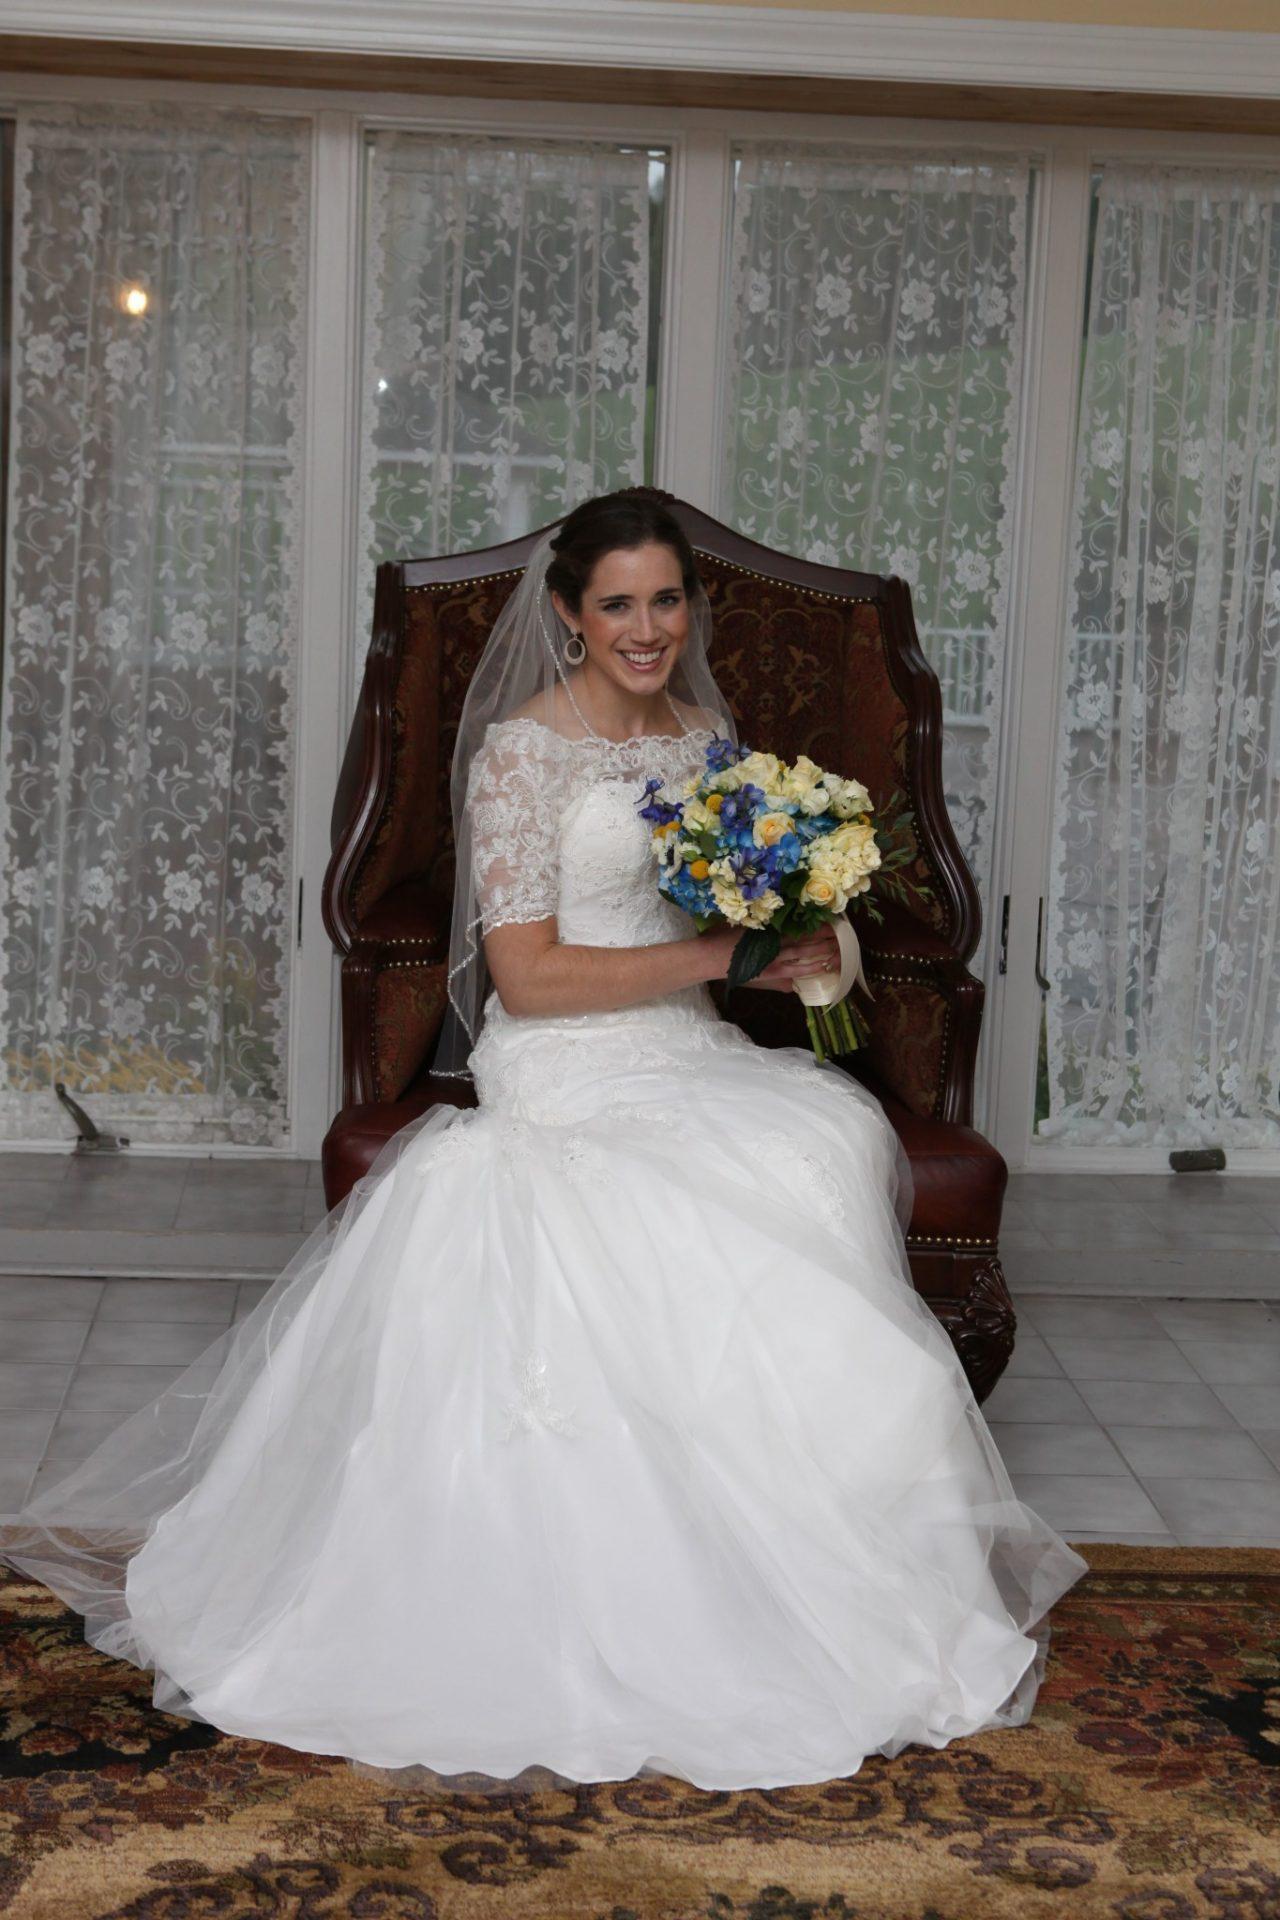 Bride posing in large bride's room before her wedding in Maryland